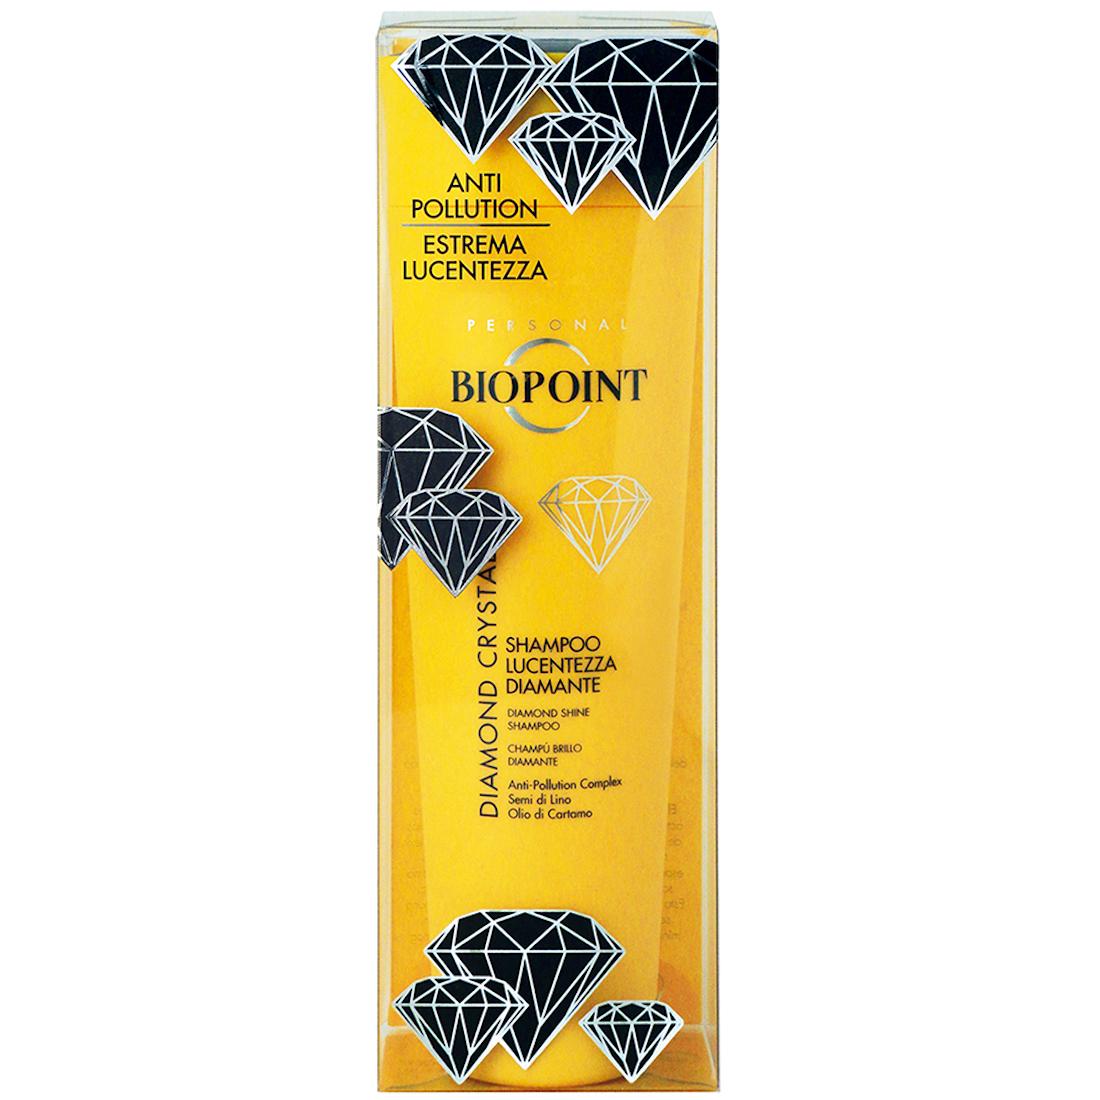 BIOPOINT Diamond Crystal Shampoo Lucentezza Diamante 200ml